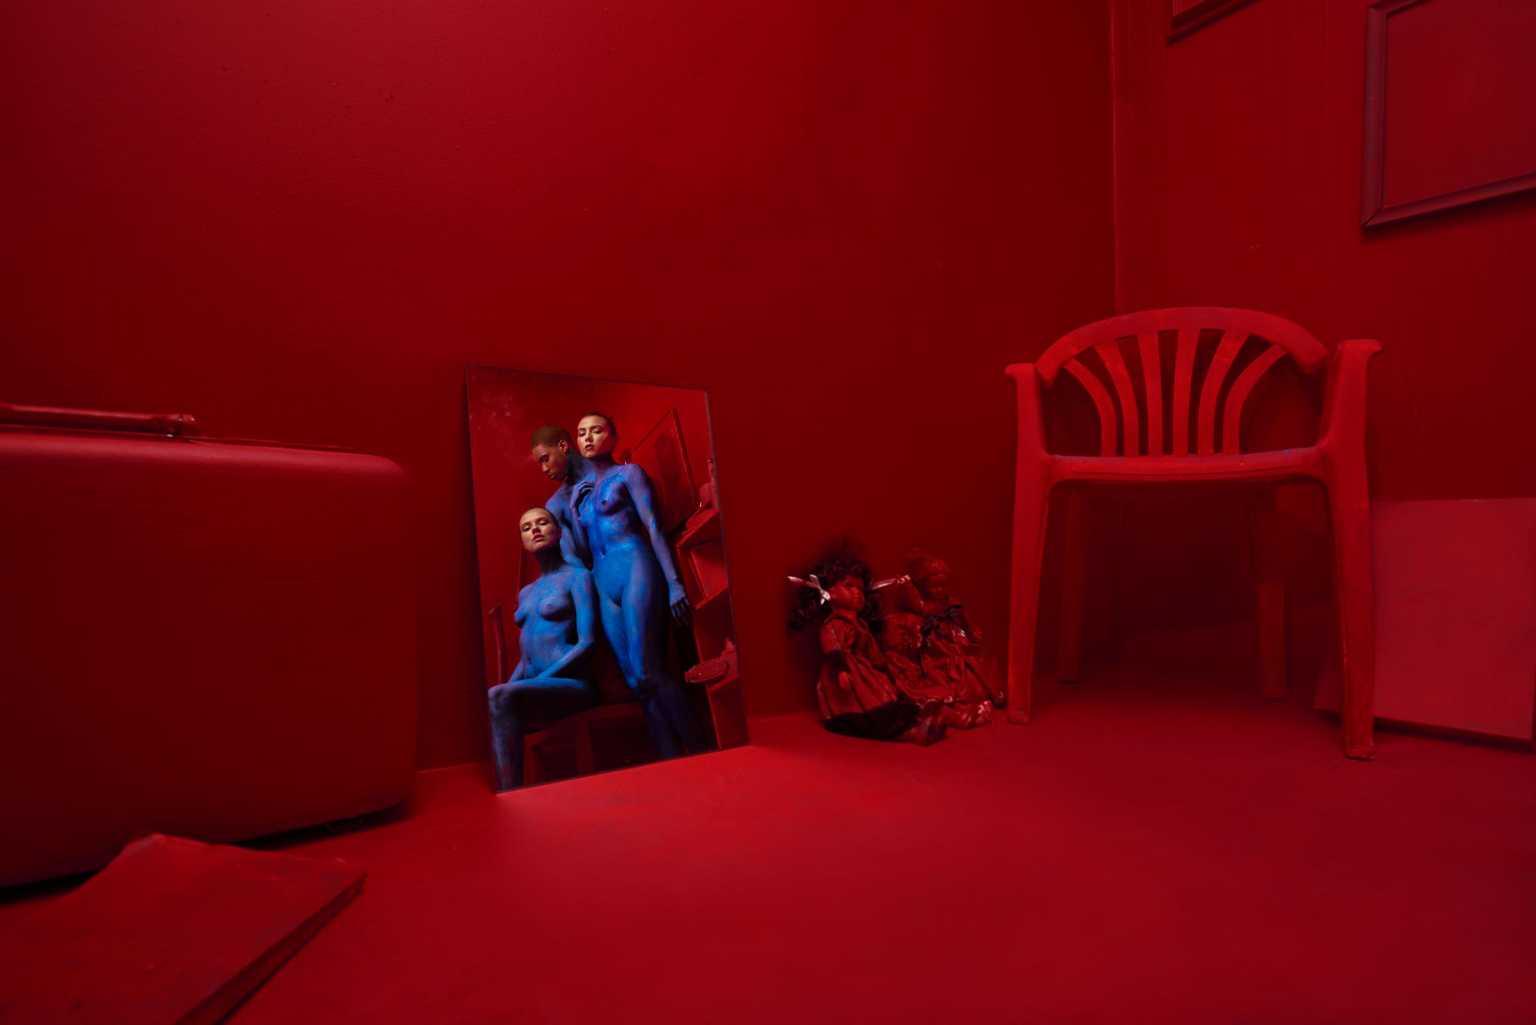 Red Mirror by Zachary Kracht